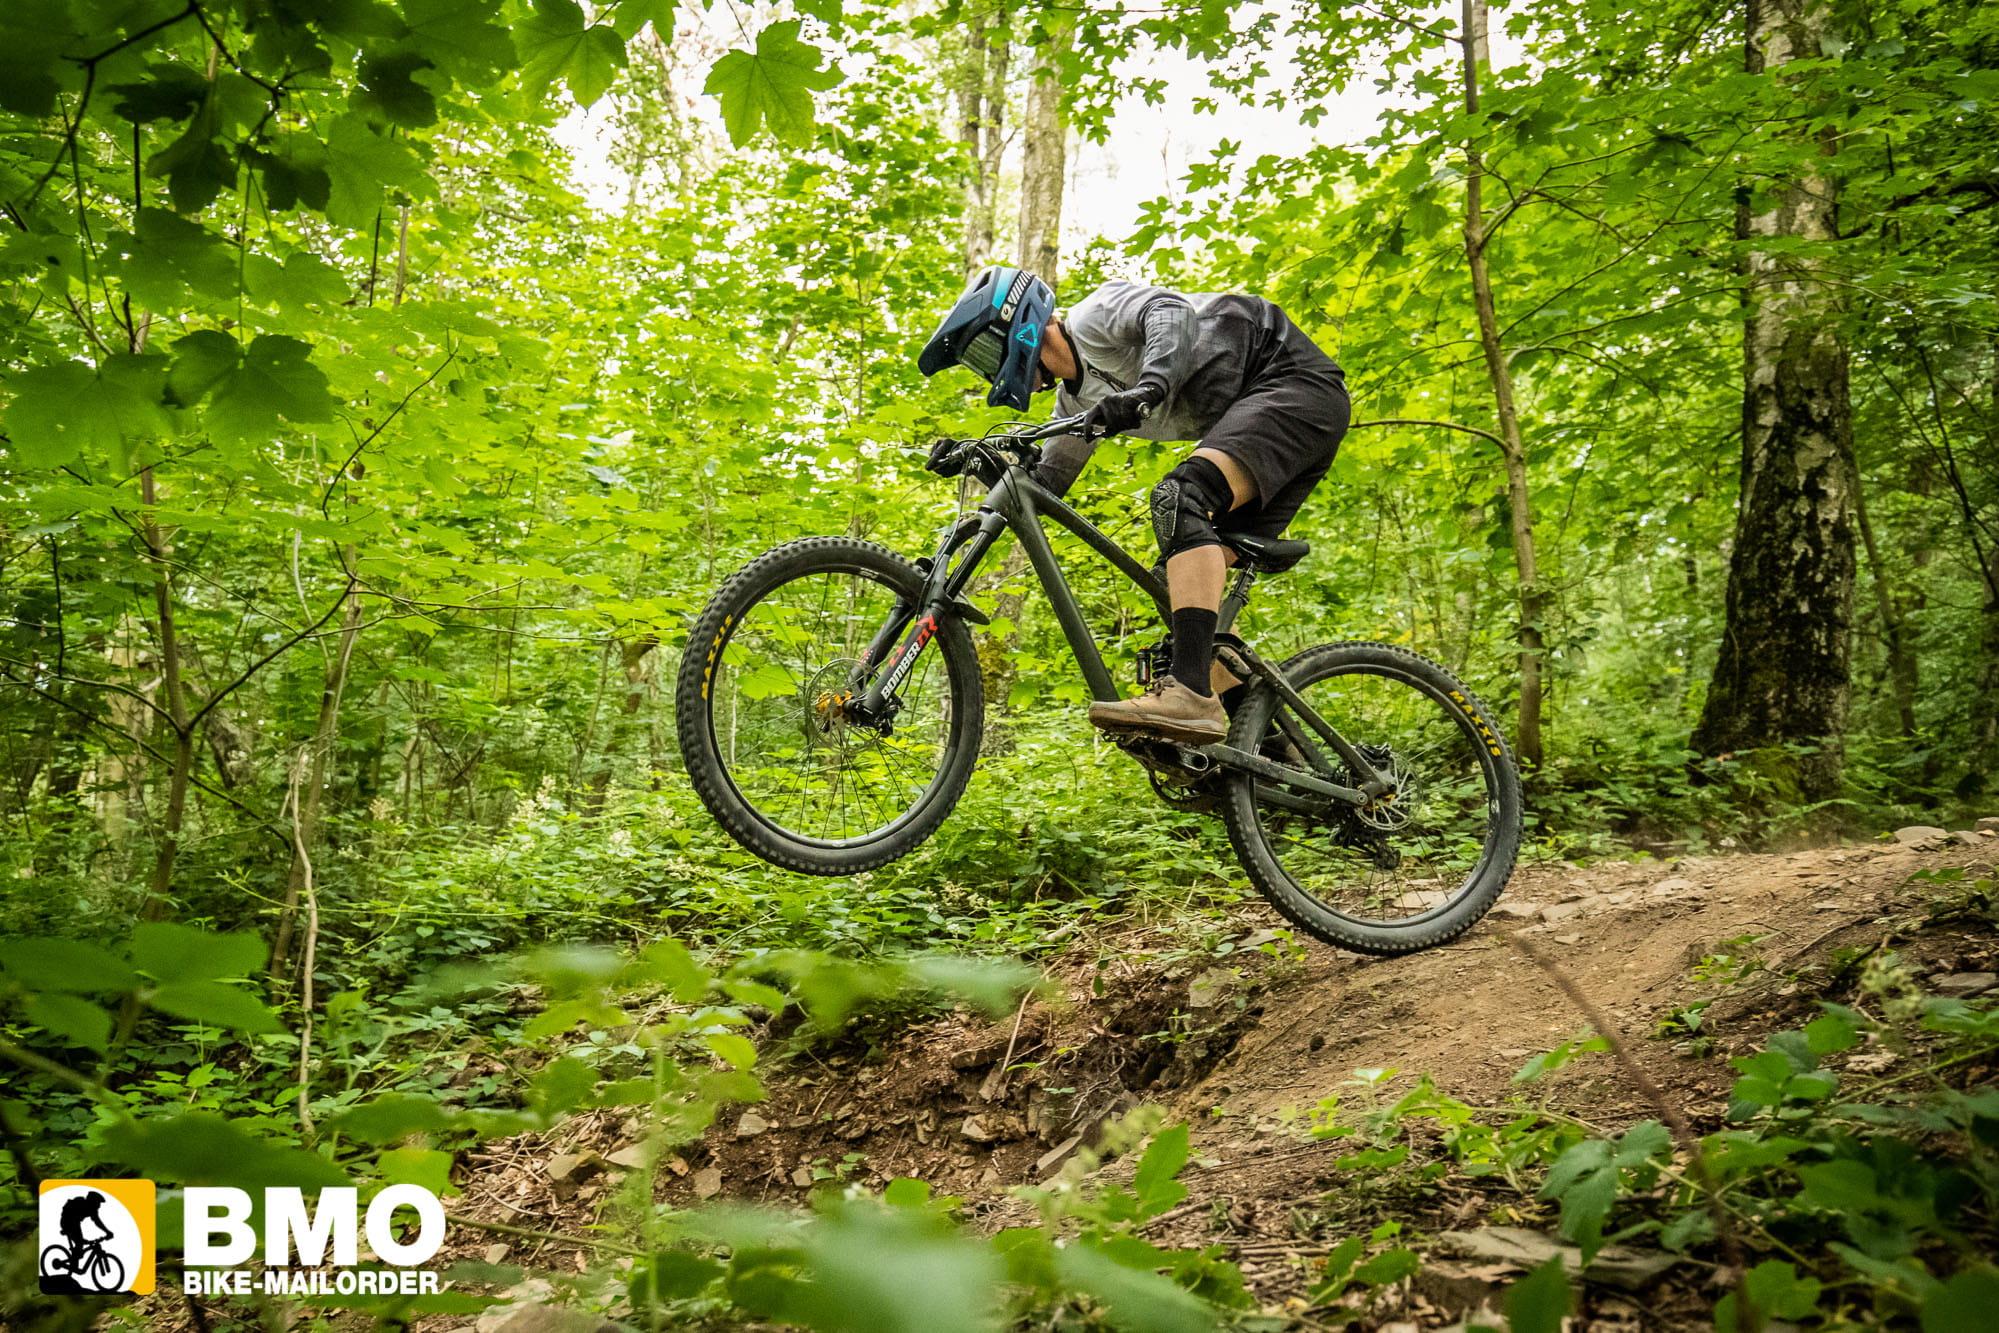 BMO-Bike-Mailorder-Marzocchi